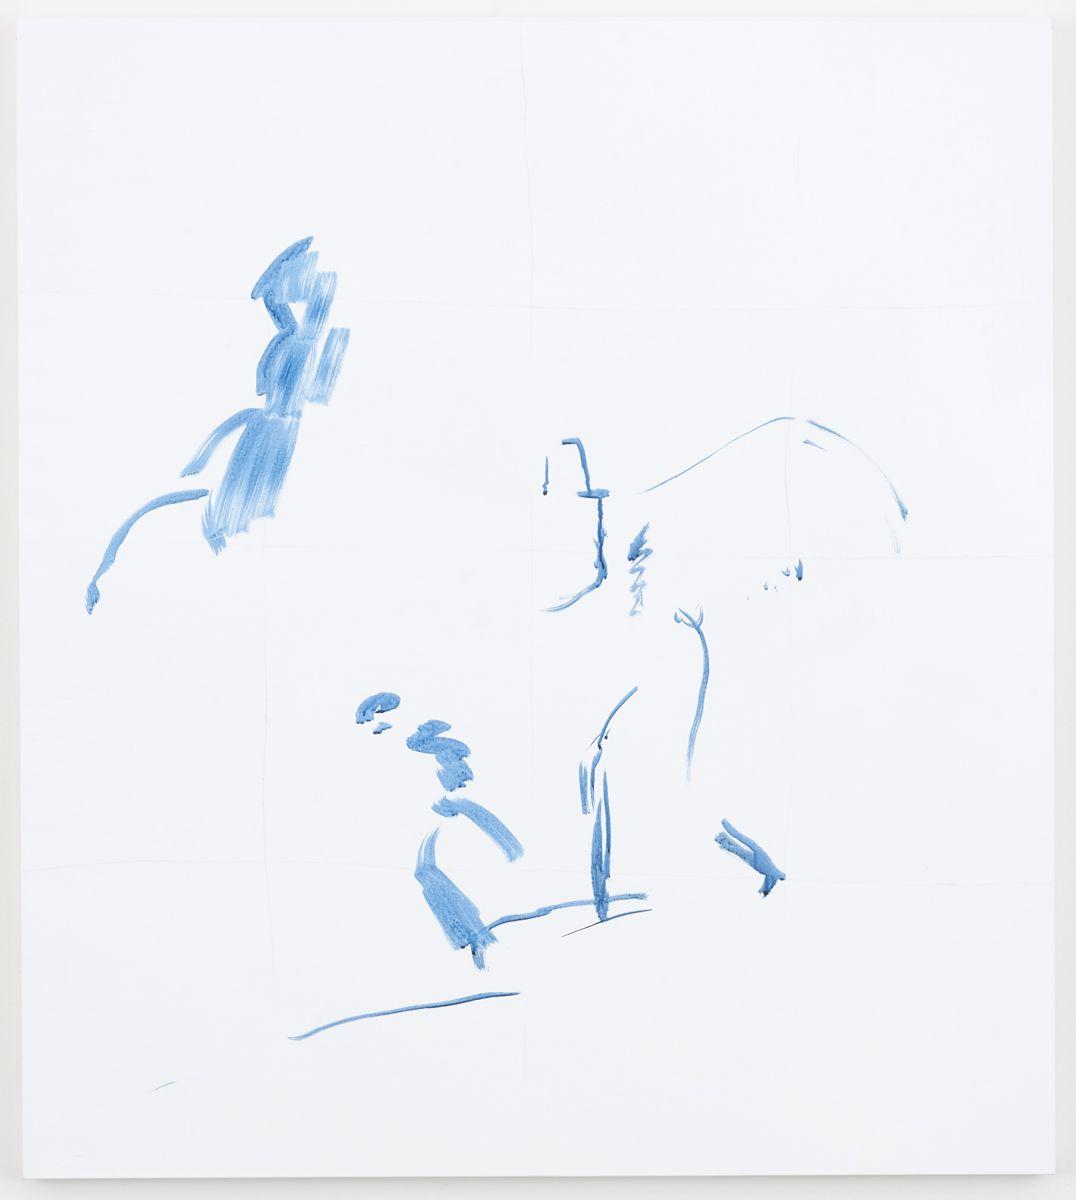 Michael Krebber Herbes de Provence, Gitanes, 2018 Acrylic on canvas 45 x 40 inches (114.3 x 101.6 cm)